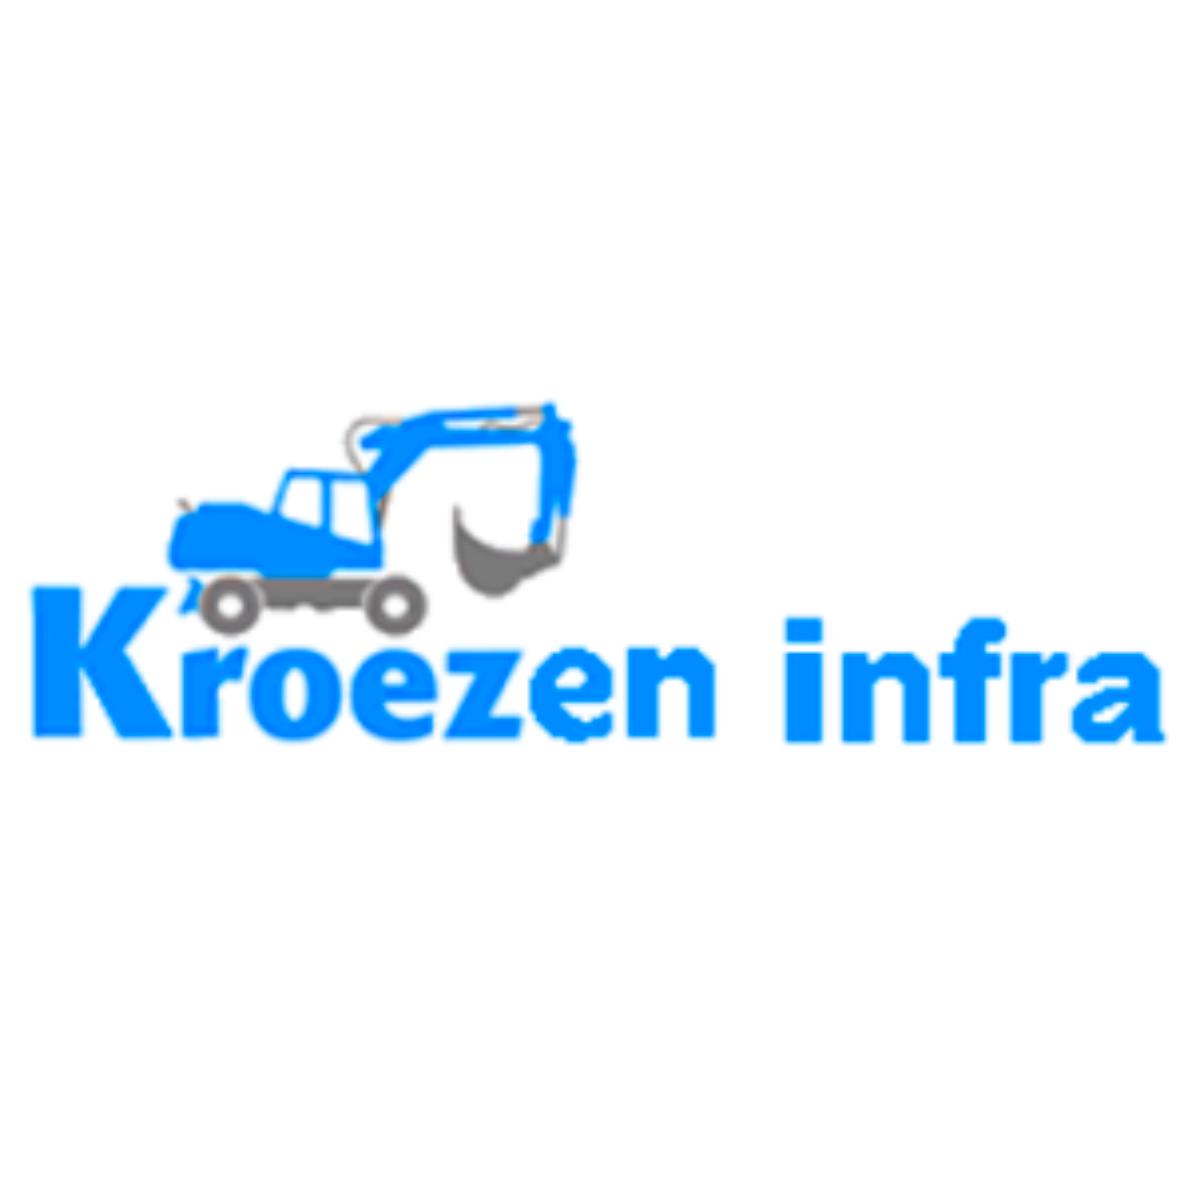 Kroezen Infra